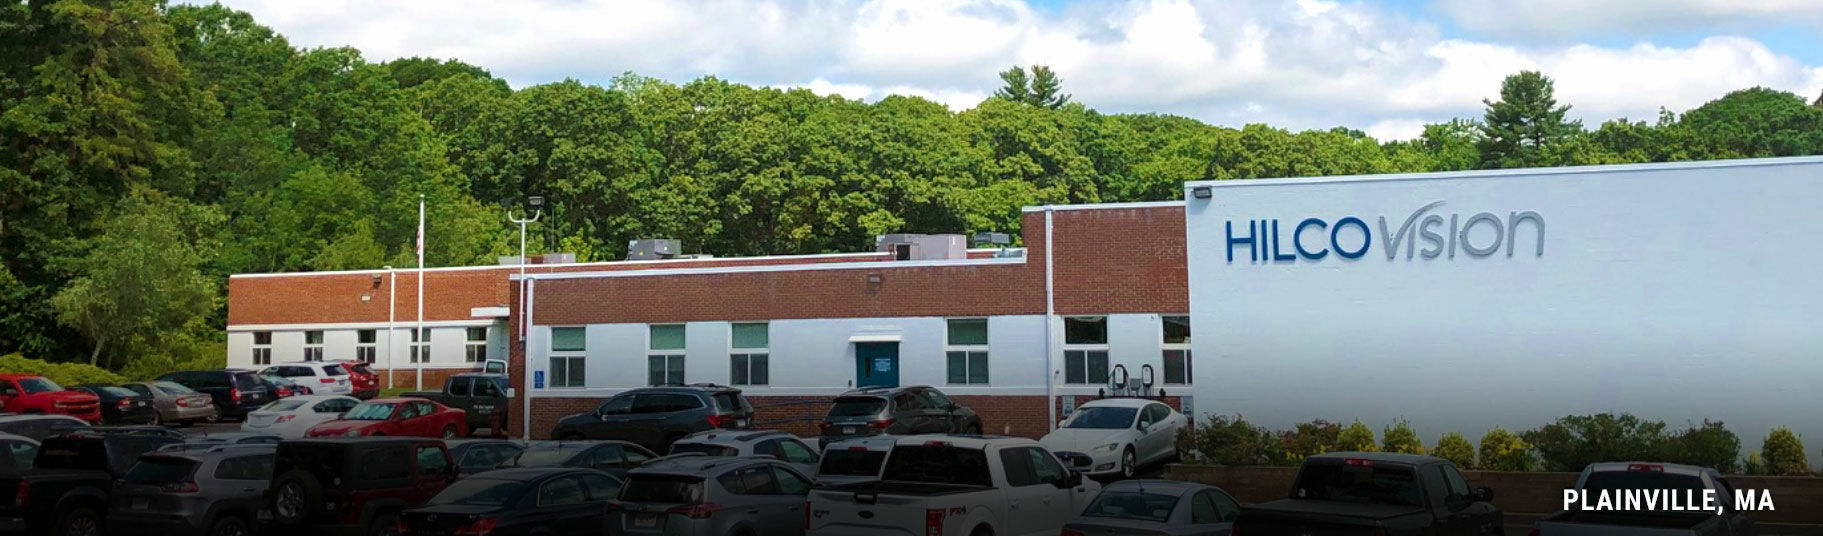 hilco-vision-headquarters-plainville-ma